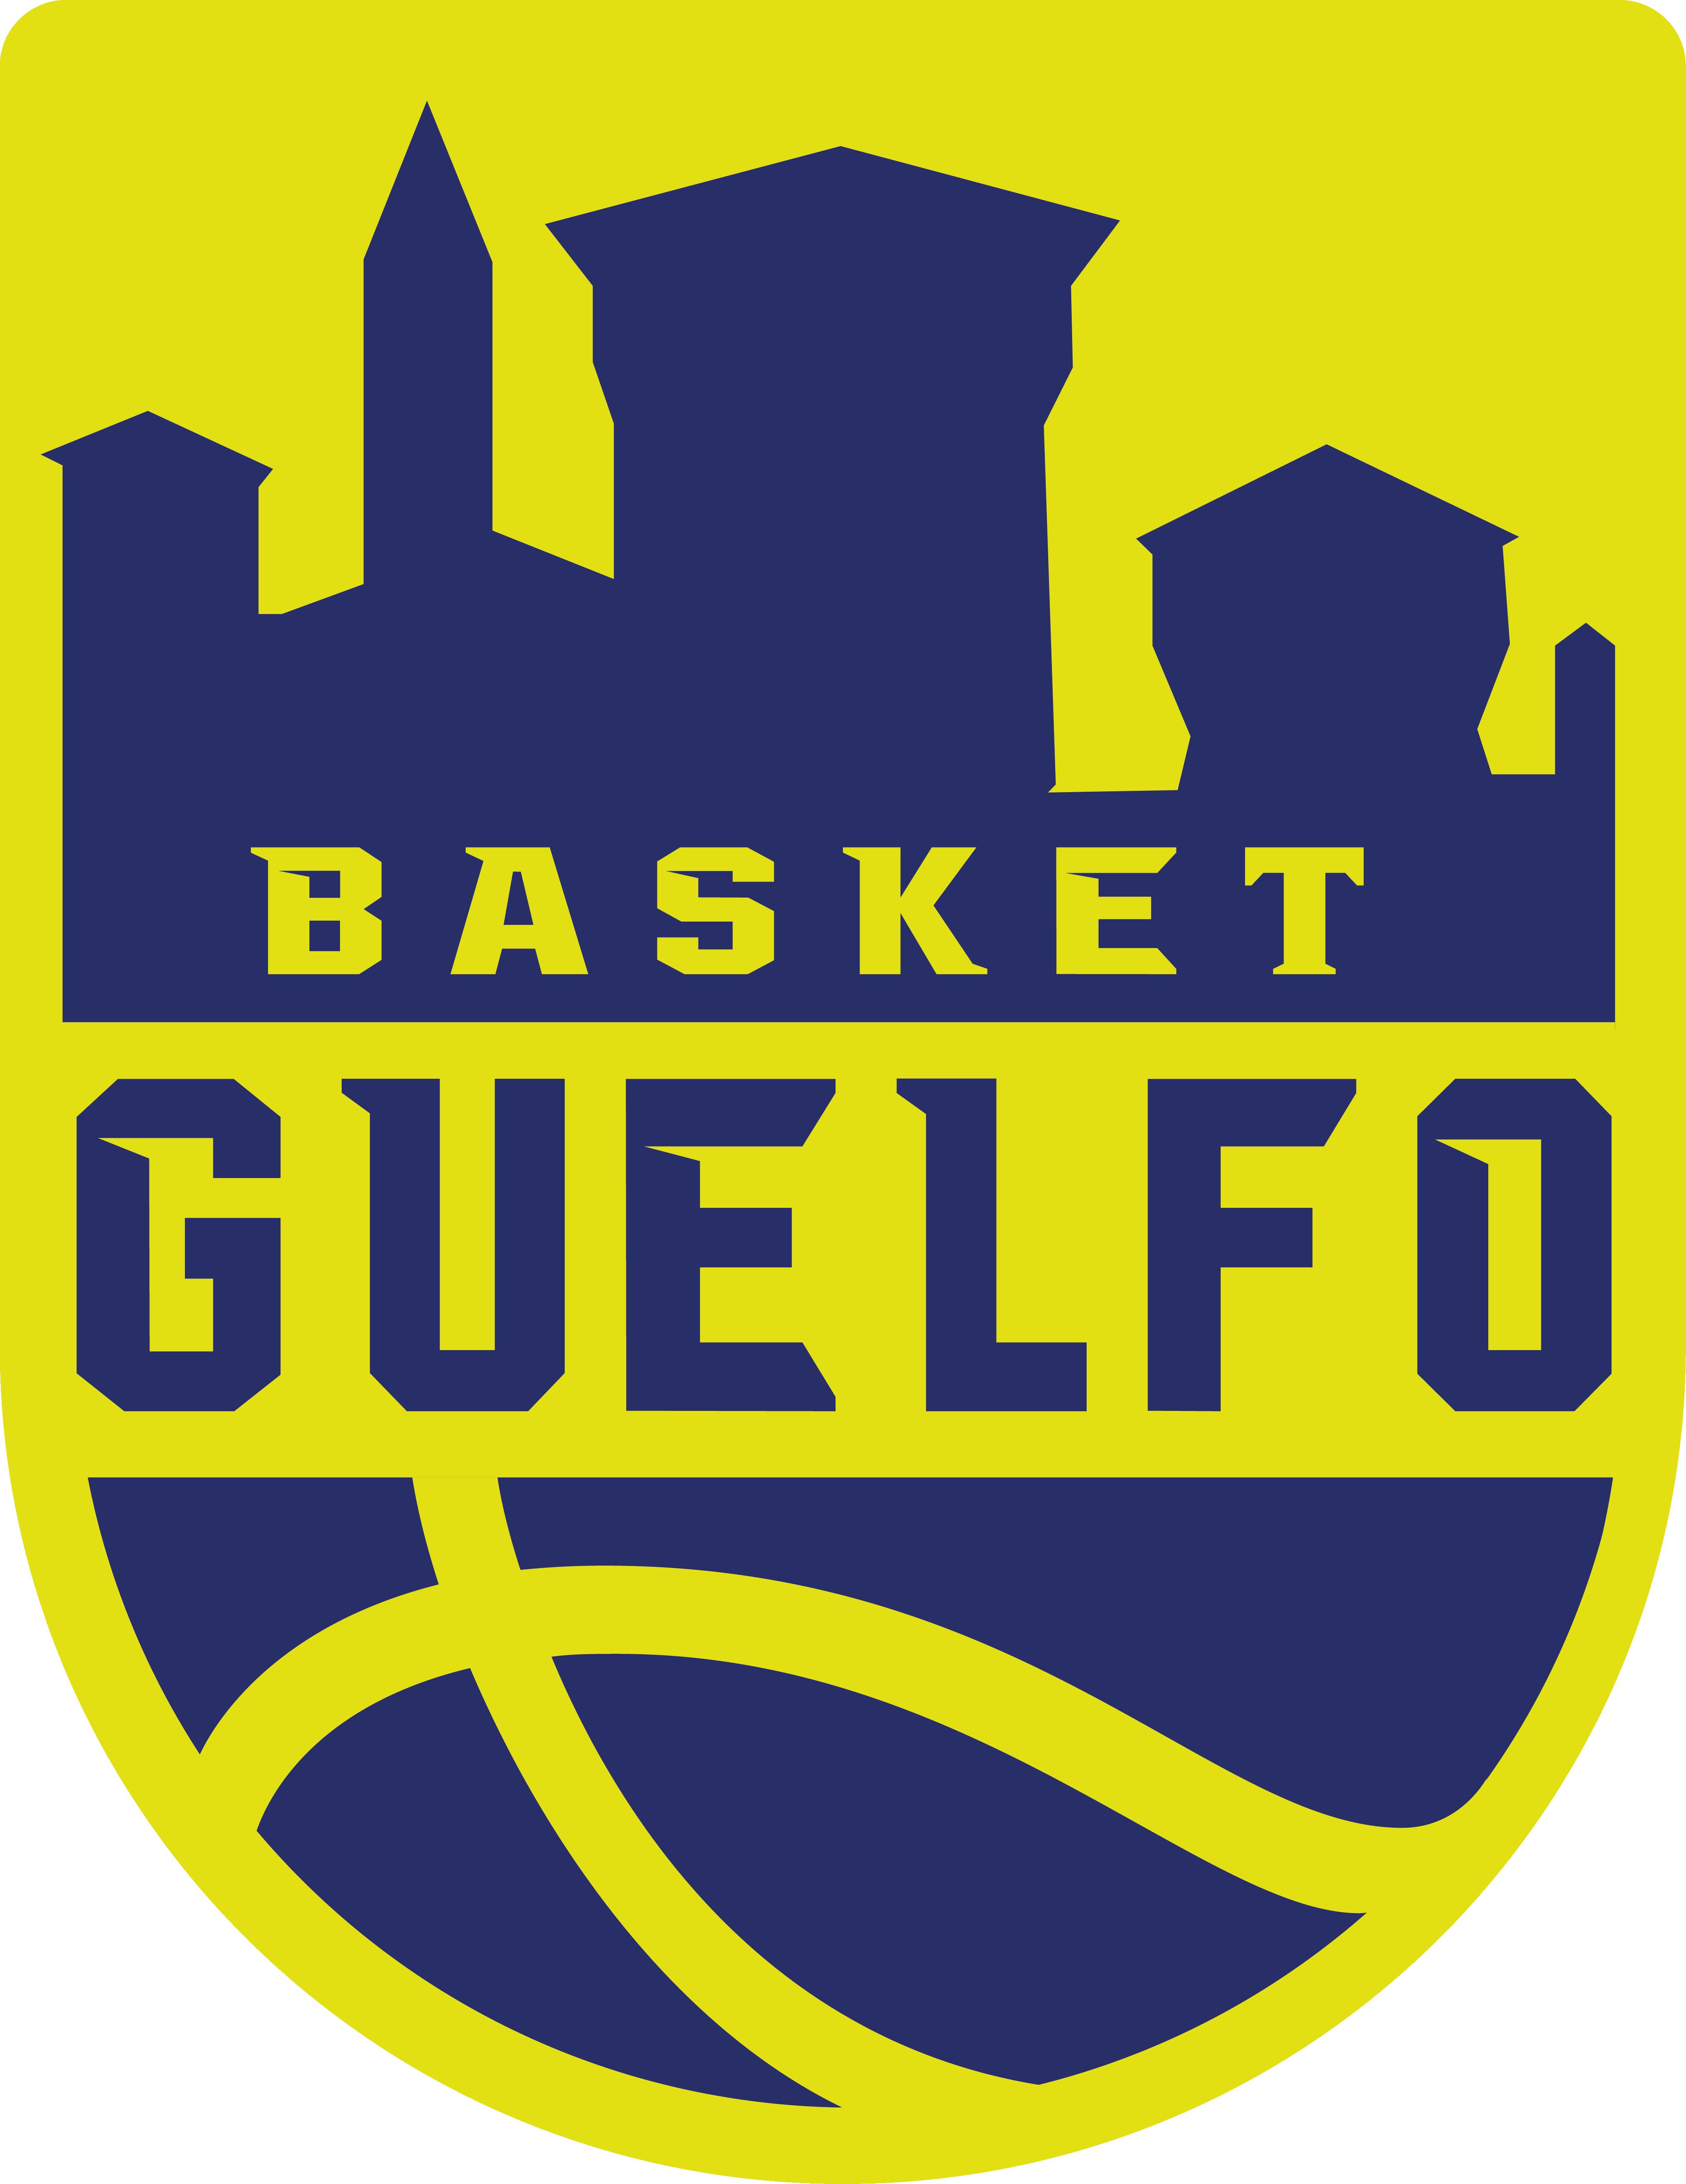 Guelfo Basket